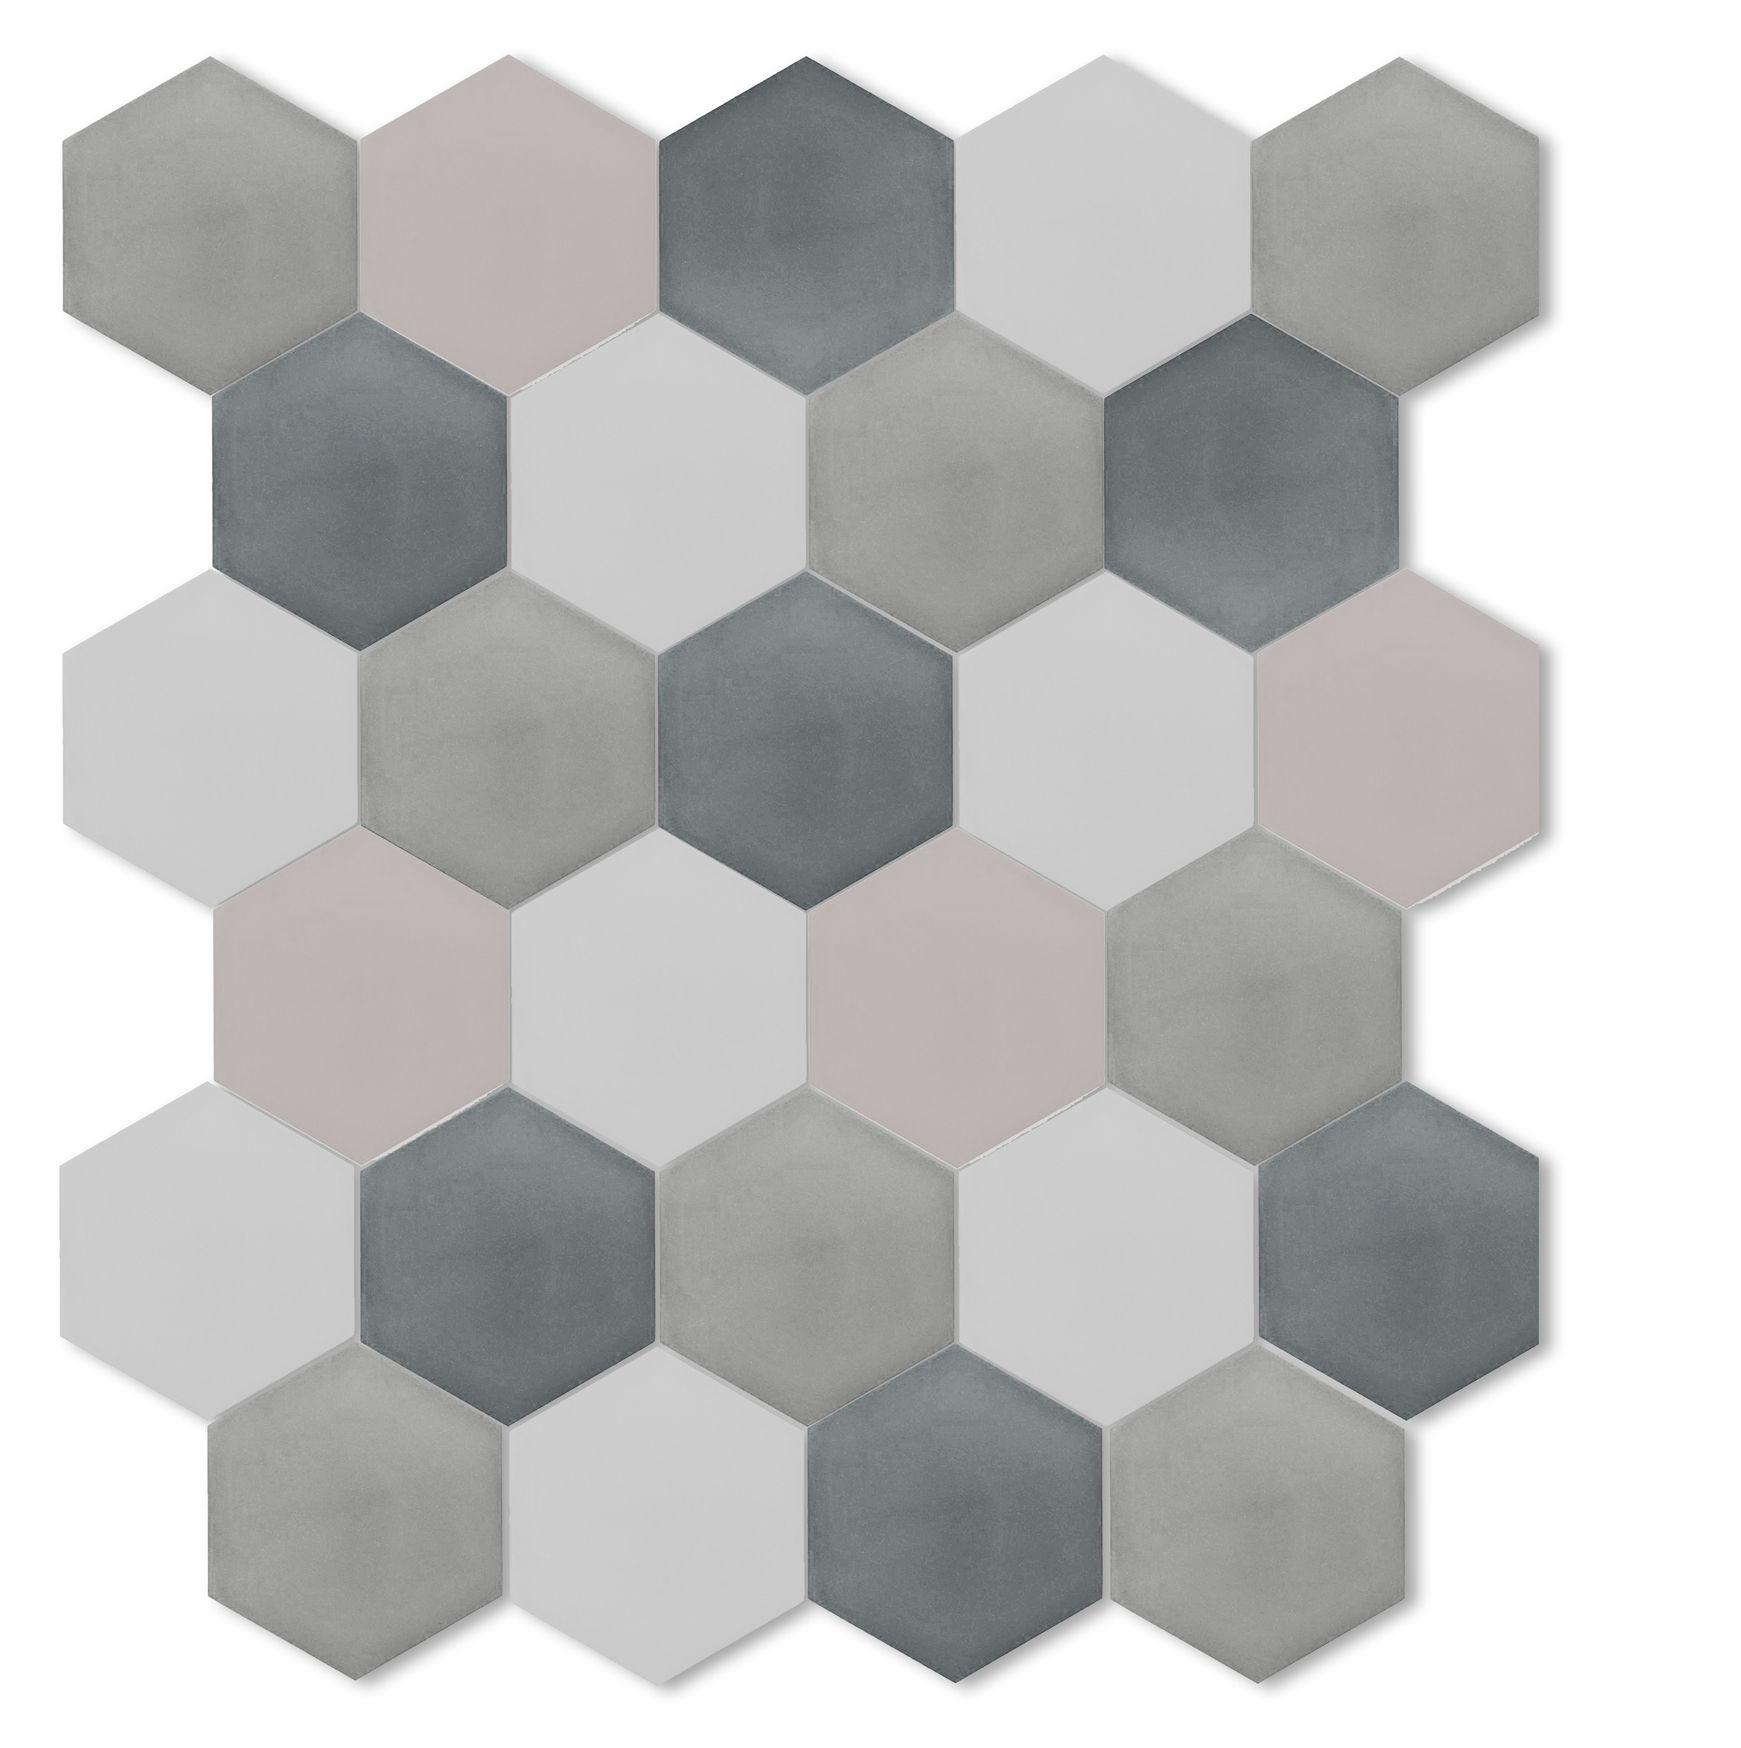 cle cement hex tiles